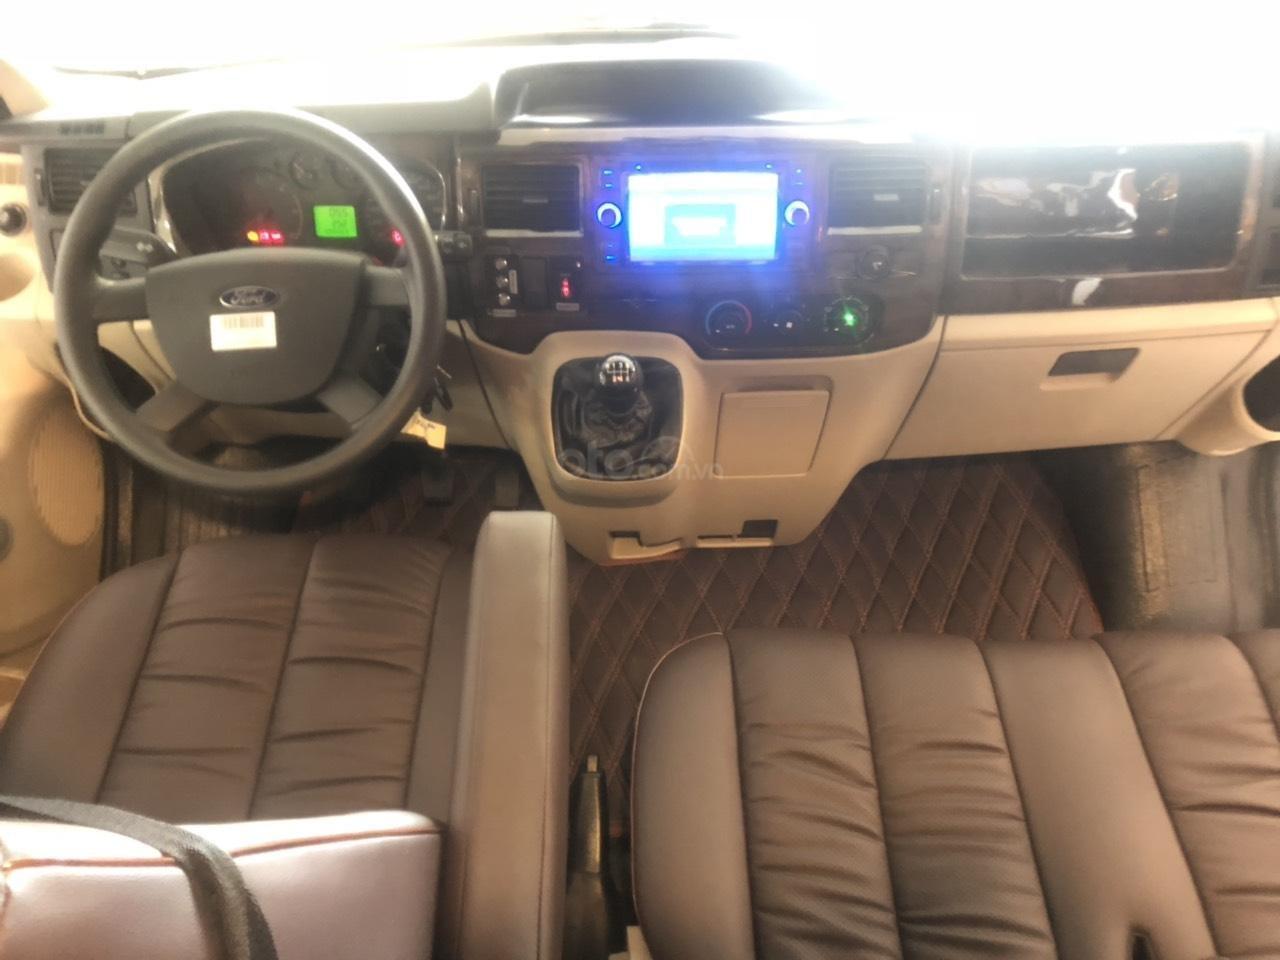 Transit Limousine 10 chỗ 2019 (9)